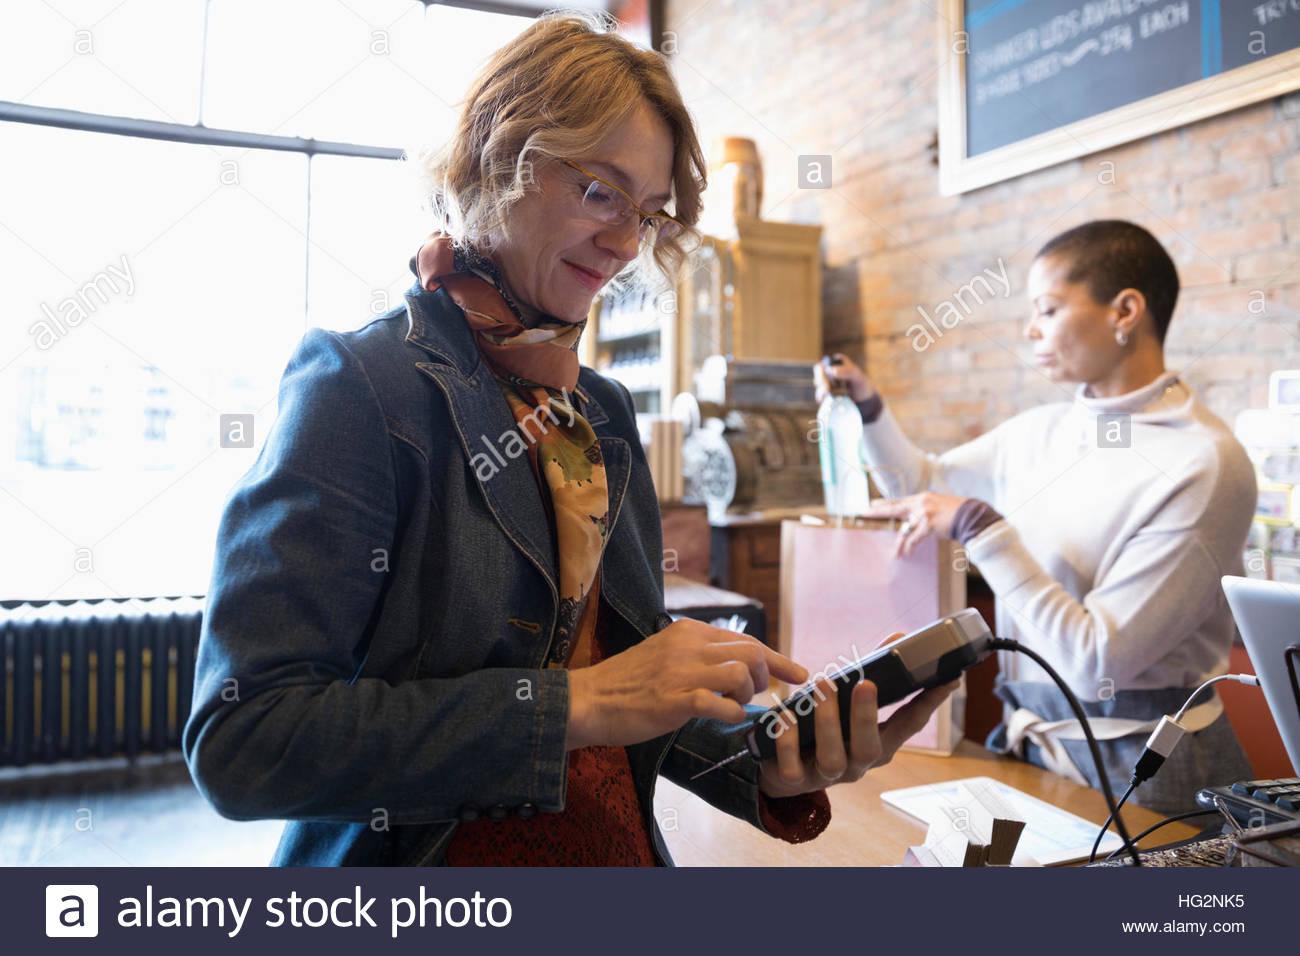 Female customer using pin entry credit card reader at shop counter - Stock Image